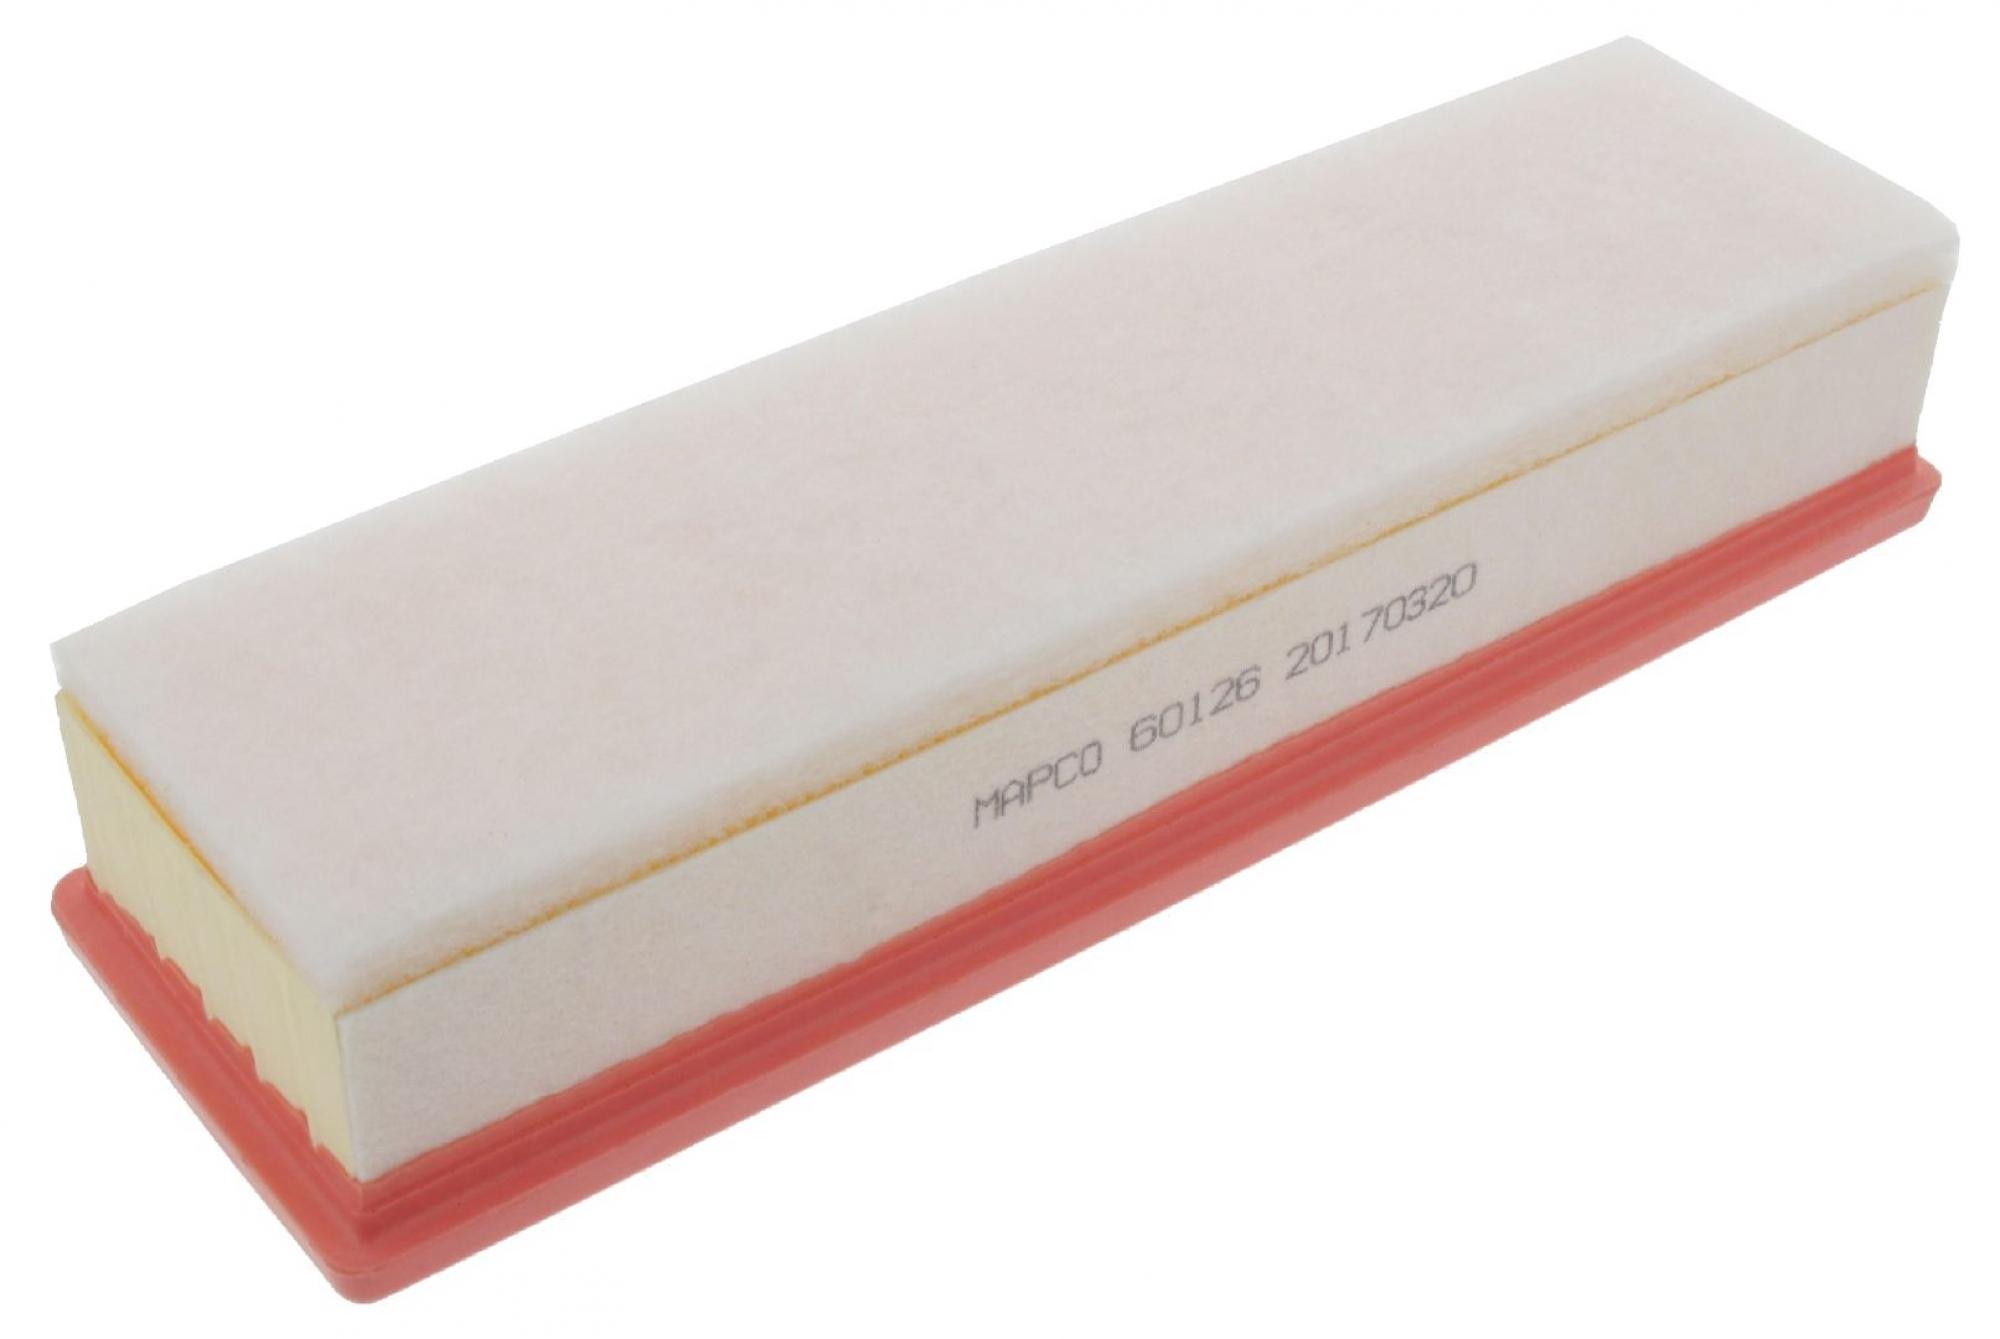 MAPCO 60126 Filtro de aire